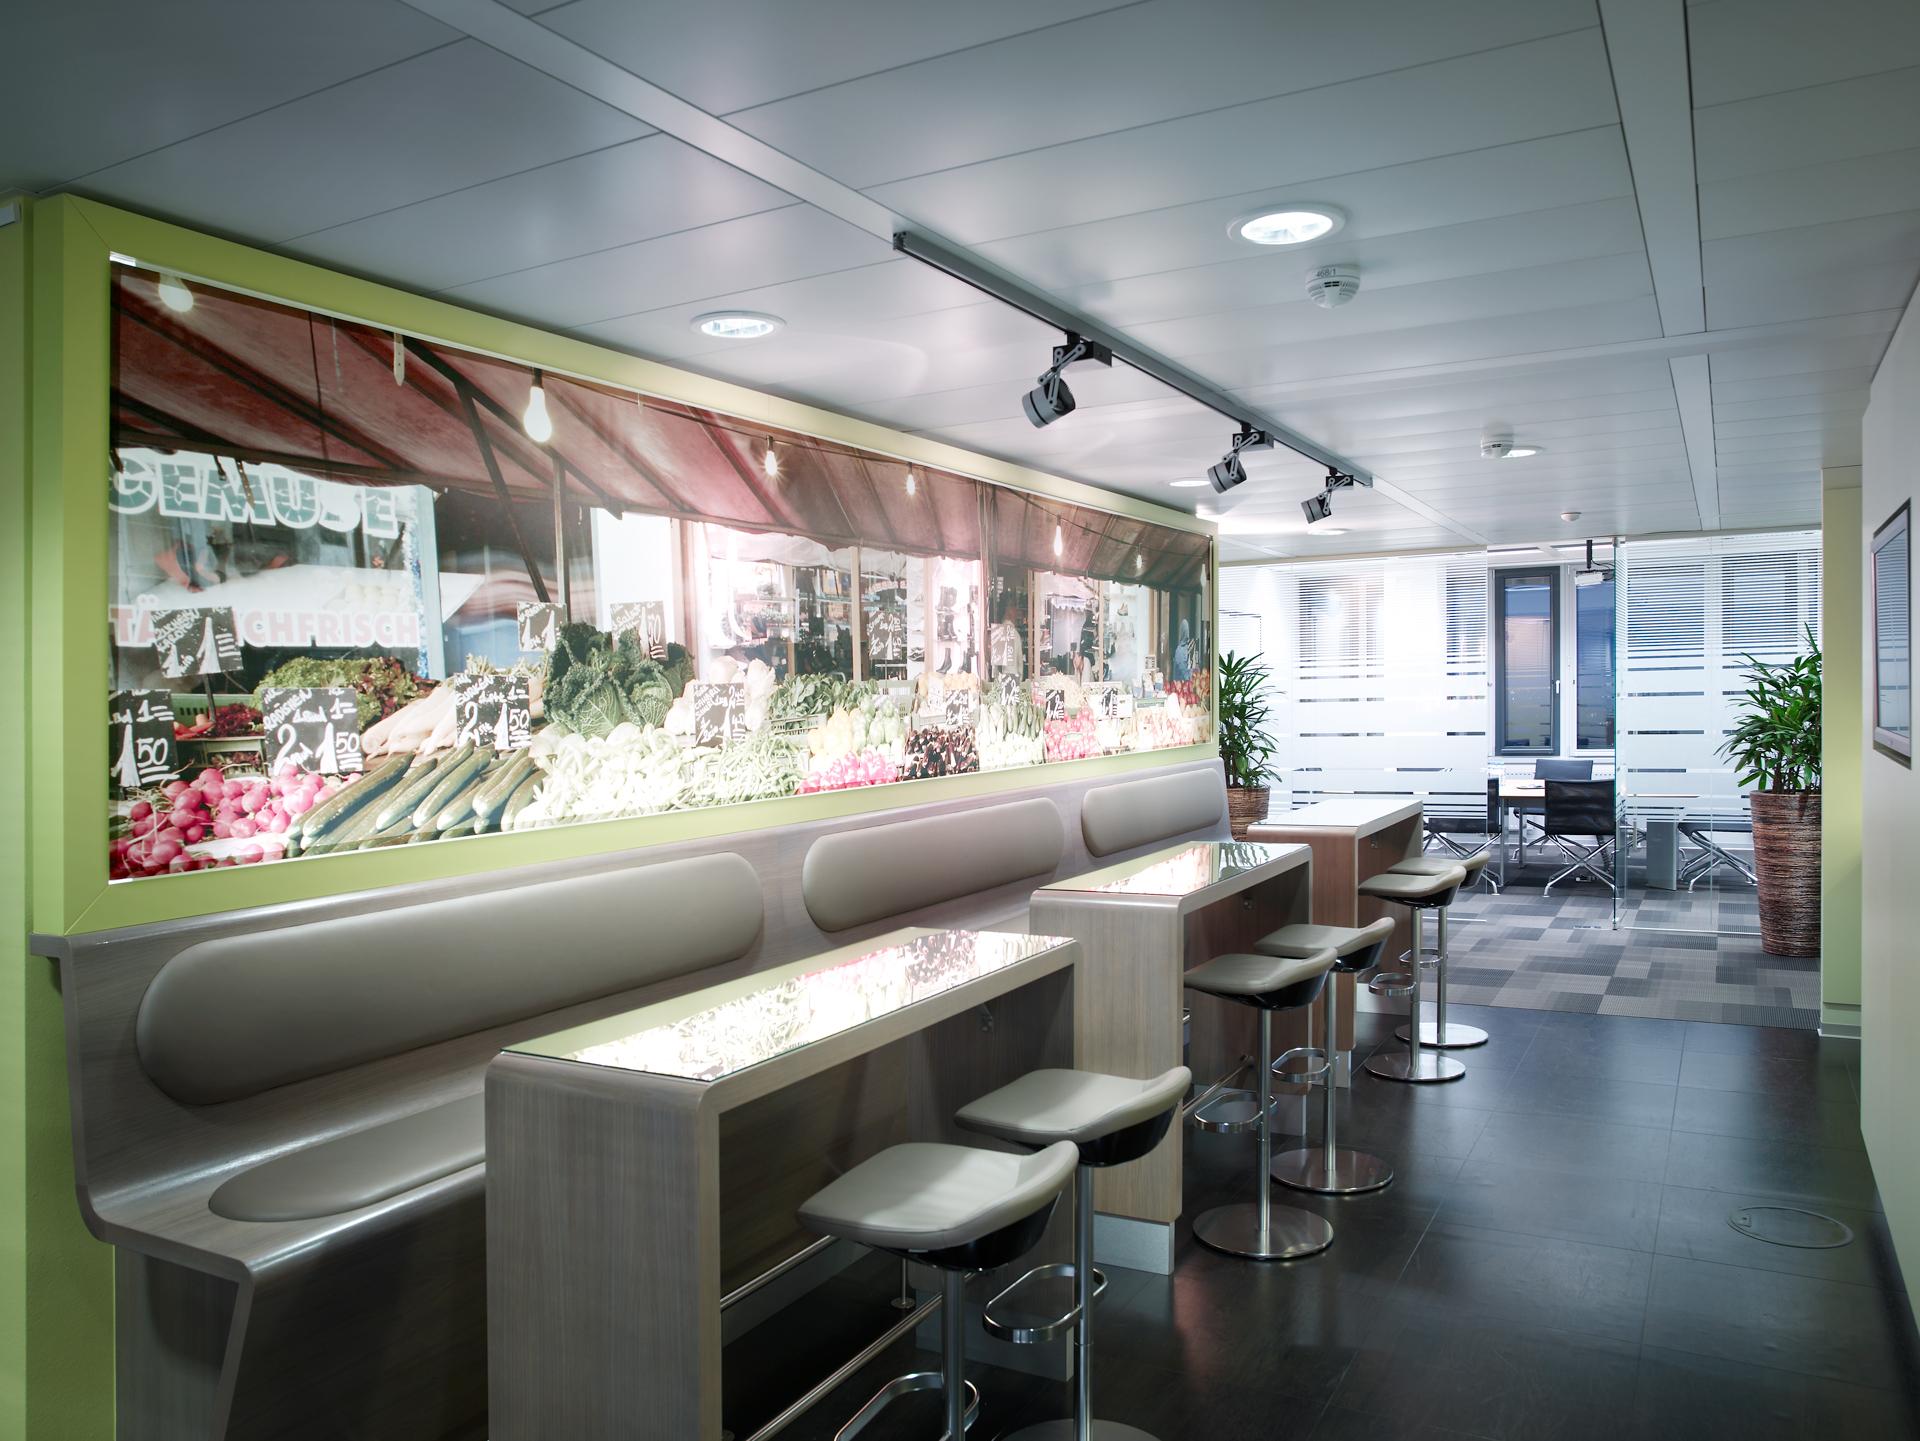 Aufenthaltsbereich im Büro Nycomed Pharma, designed von Studio Thörnblom